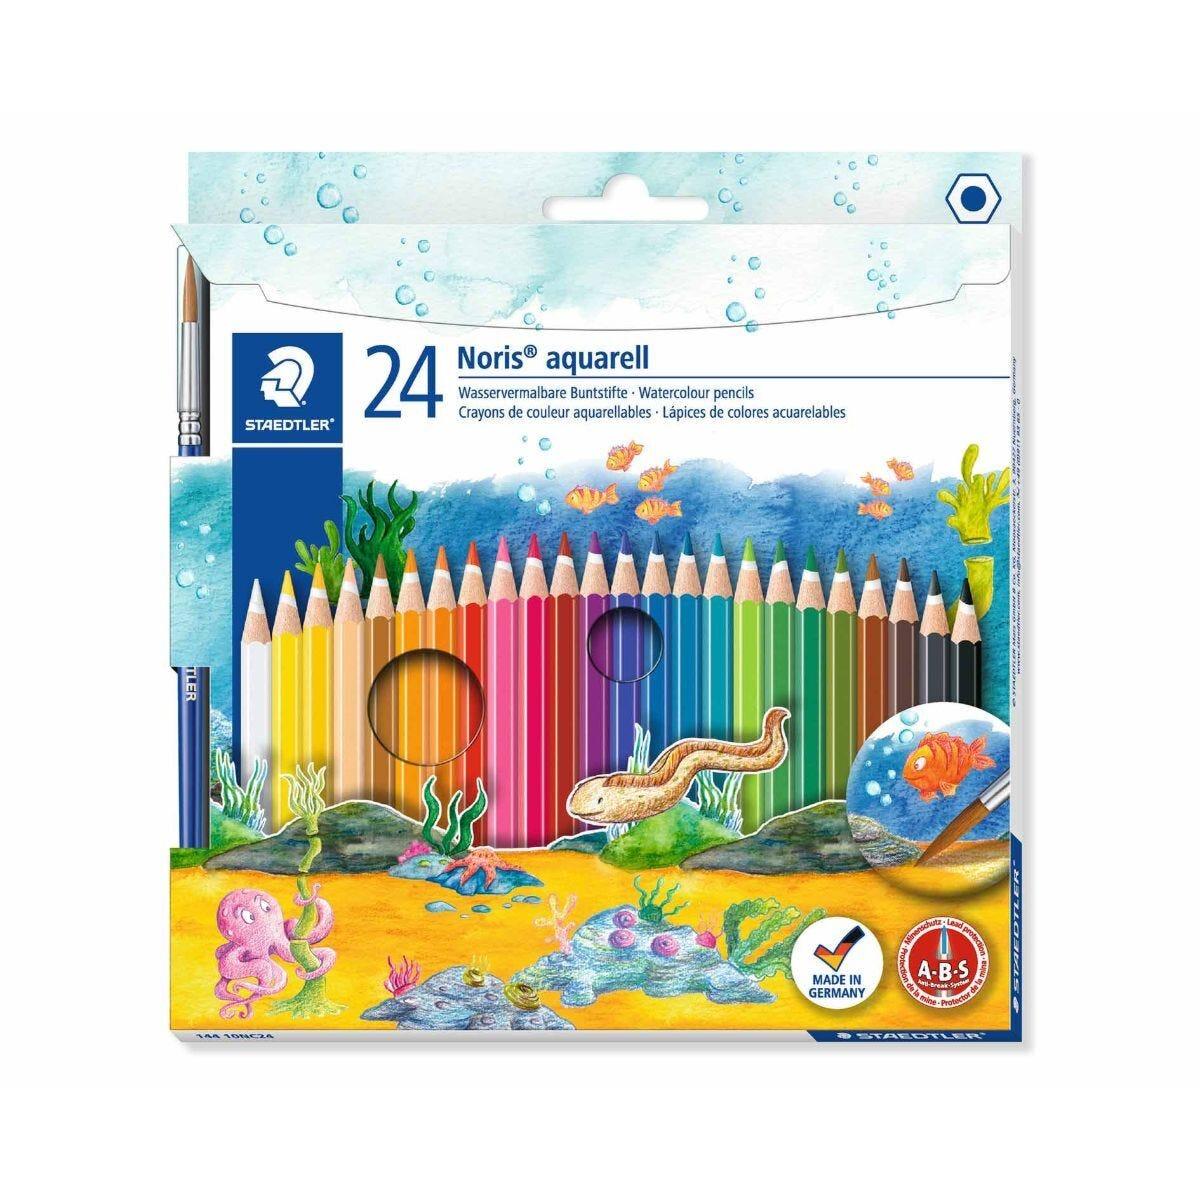 Staedtler Watercolour Pencils Pack of 24